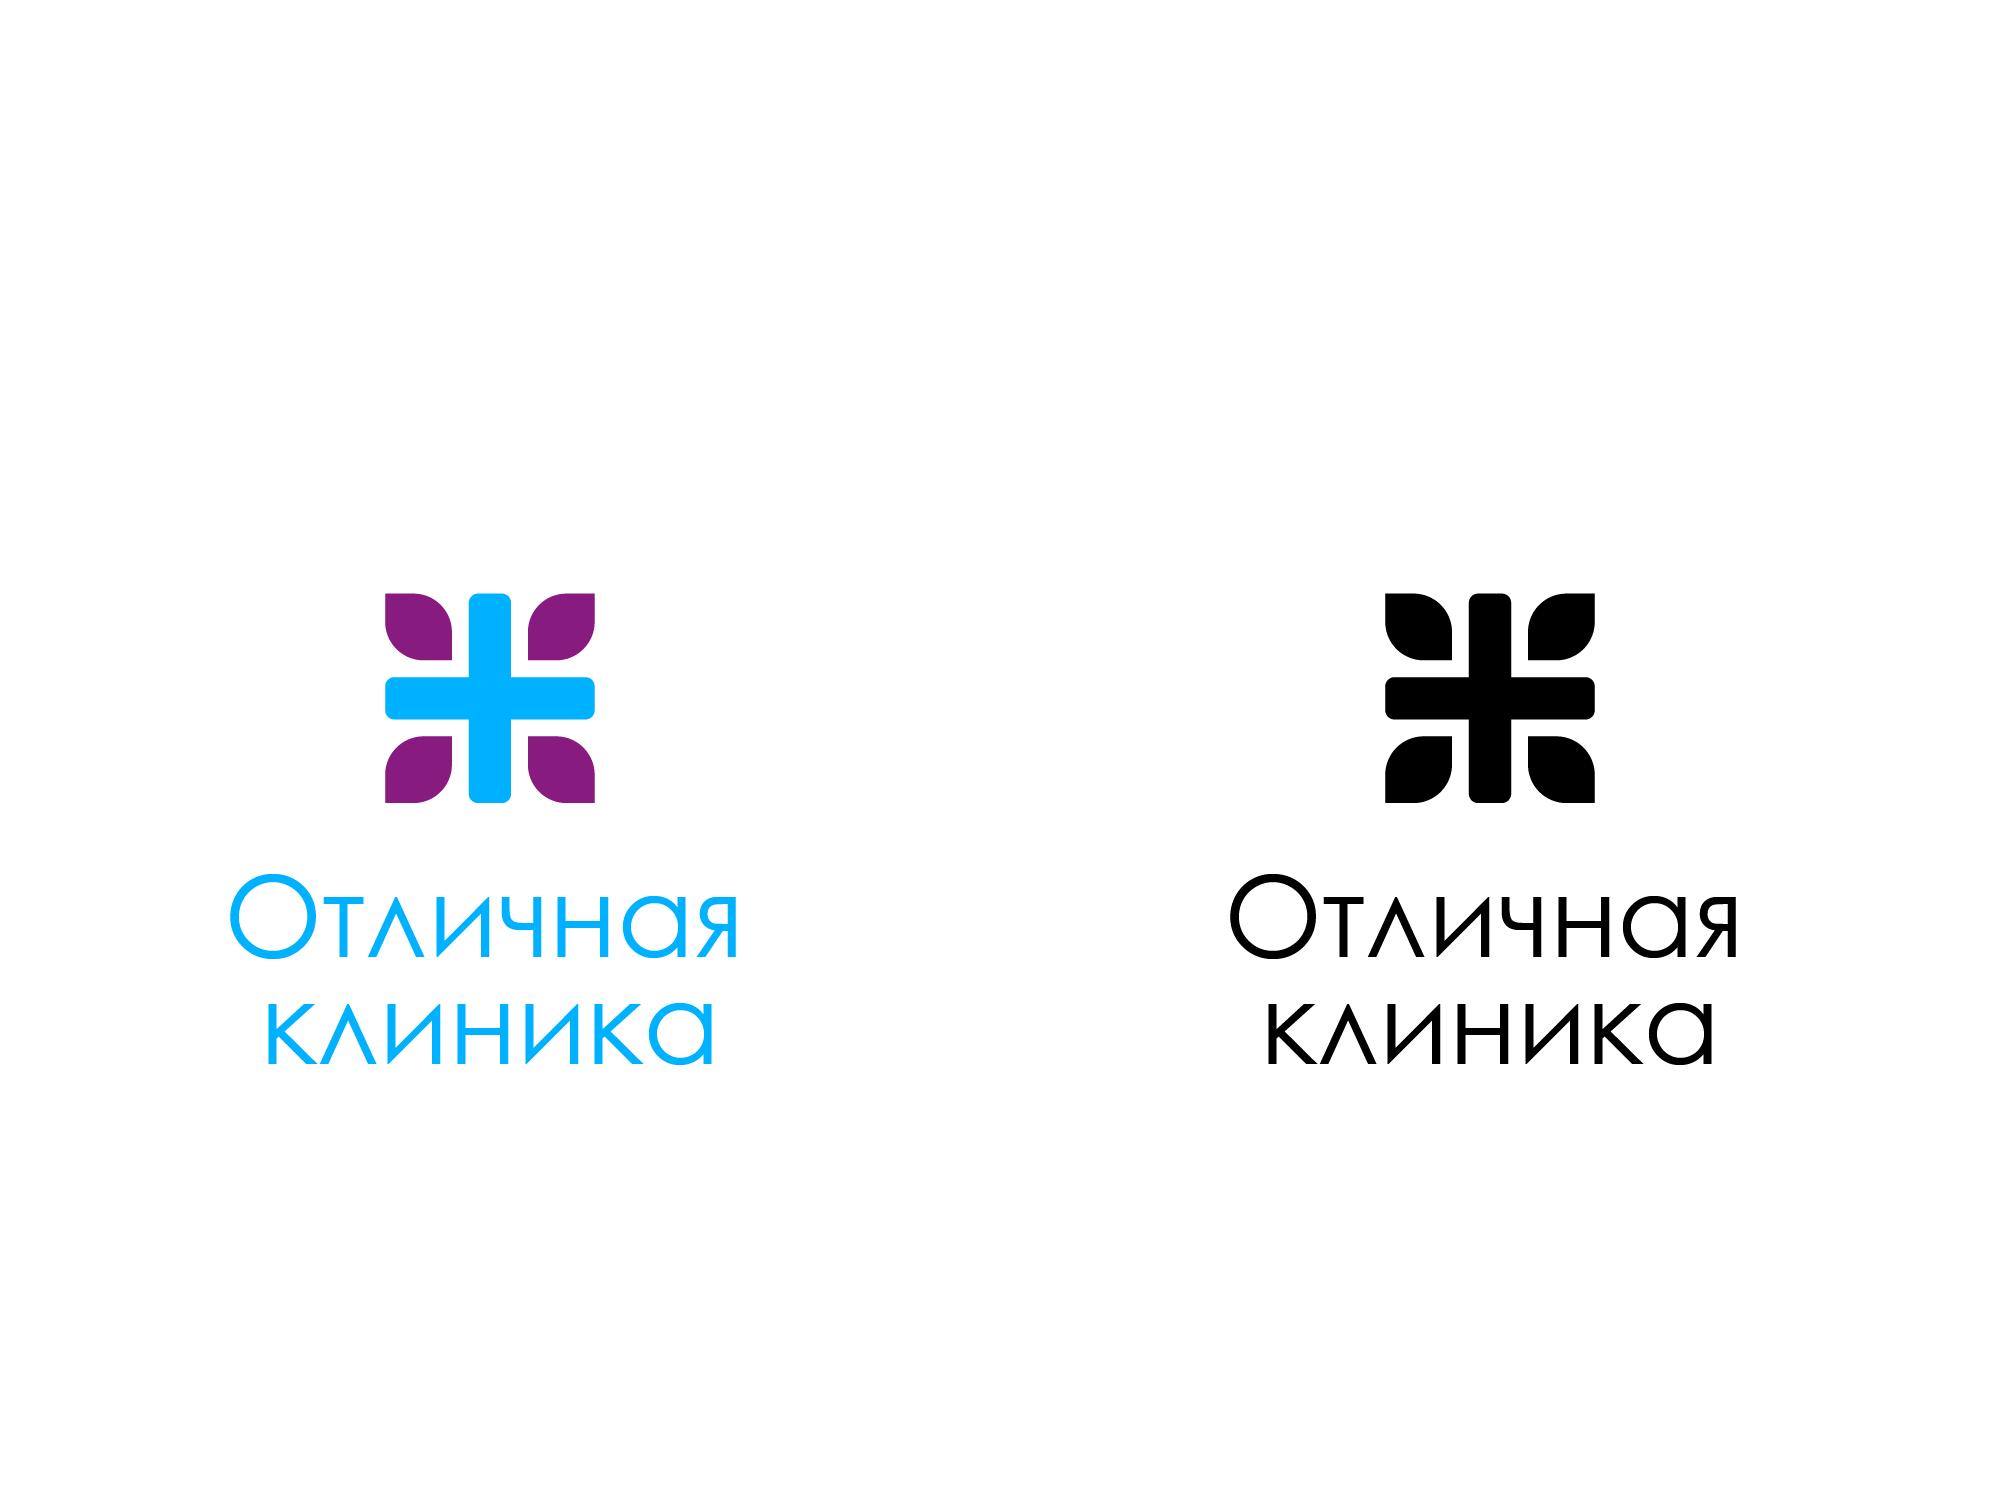 Логотип и фирменный стиль частной клиники фото f_8635c934c909e2b2.png